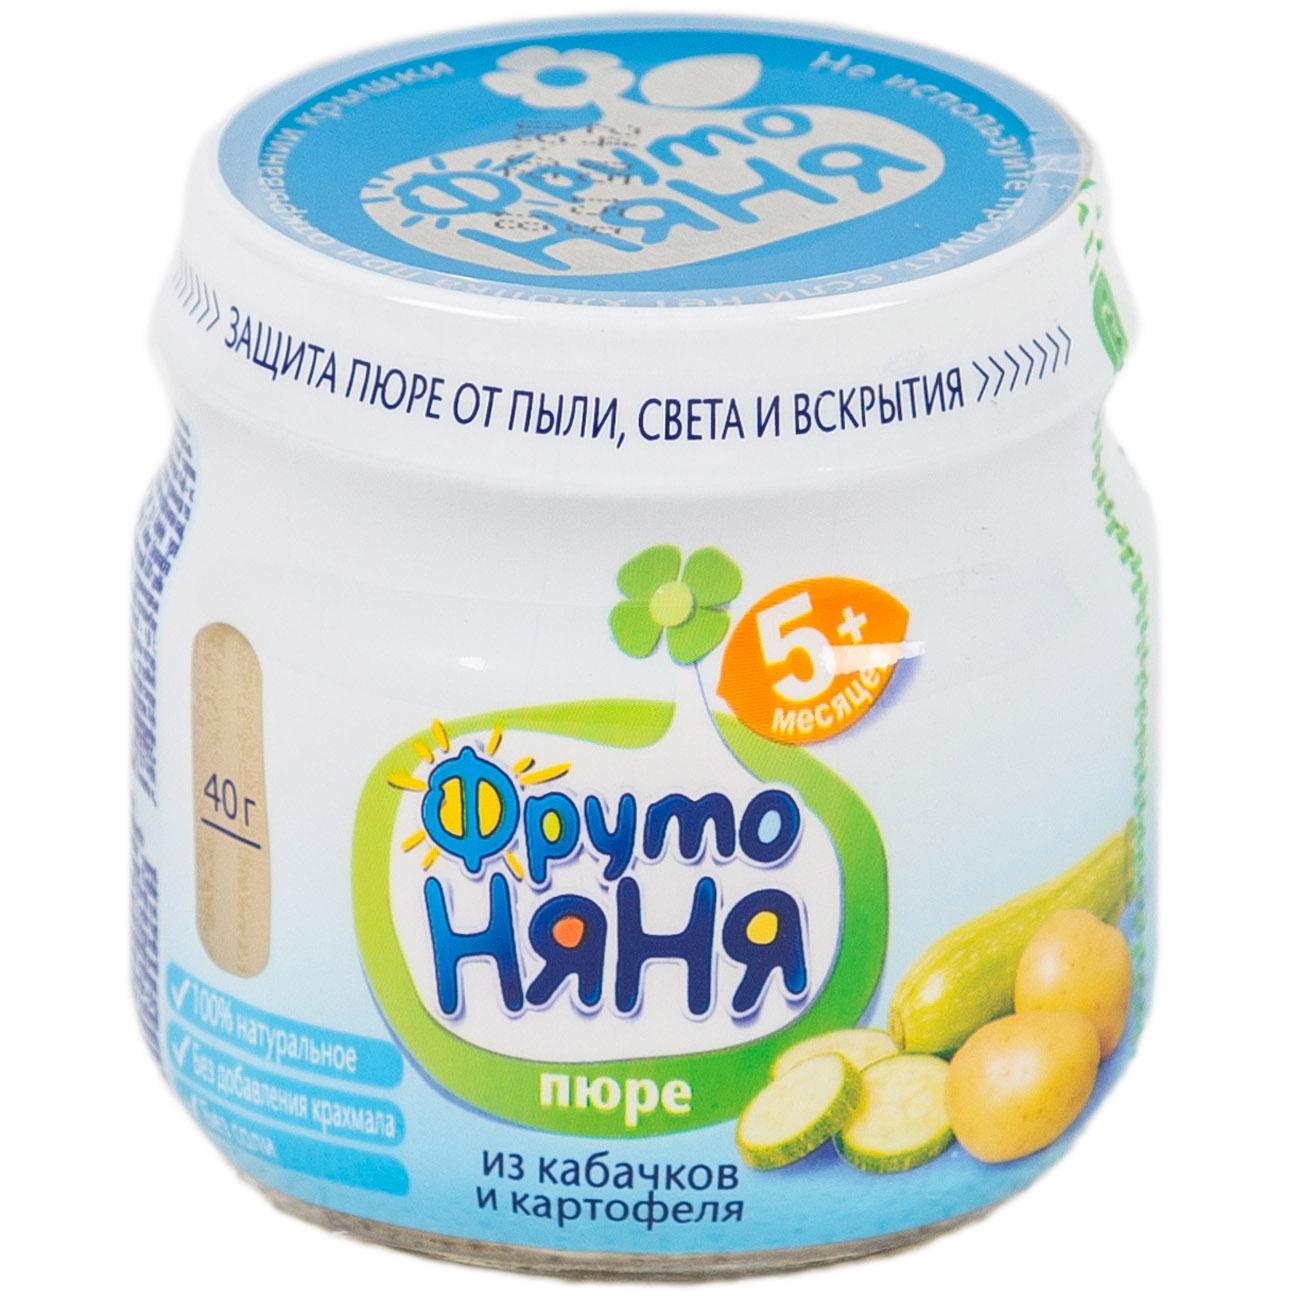 Пюре Фрутоняня овощное (без сахара) 80 гр Кабачки с картофелем (с 5 мес)<br>